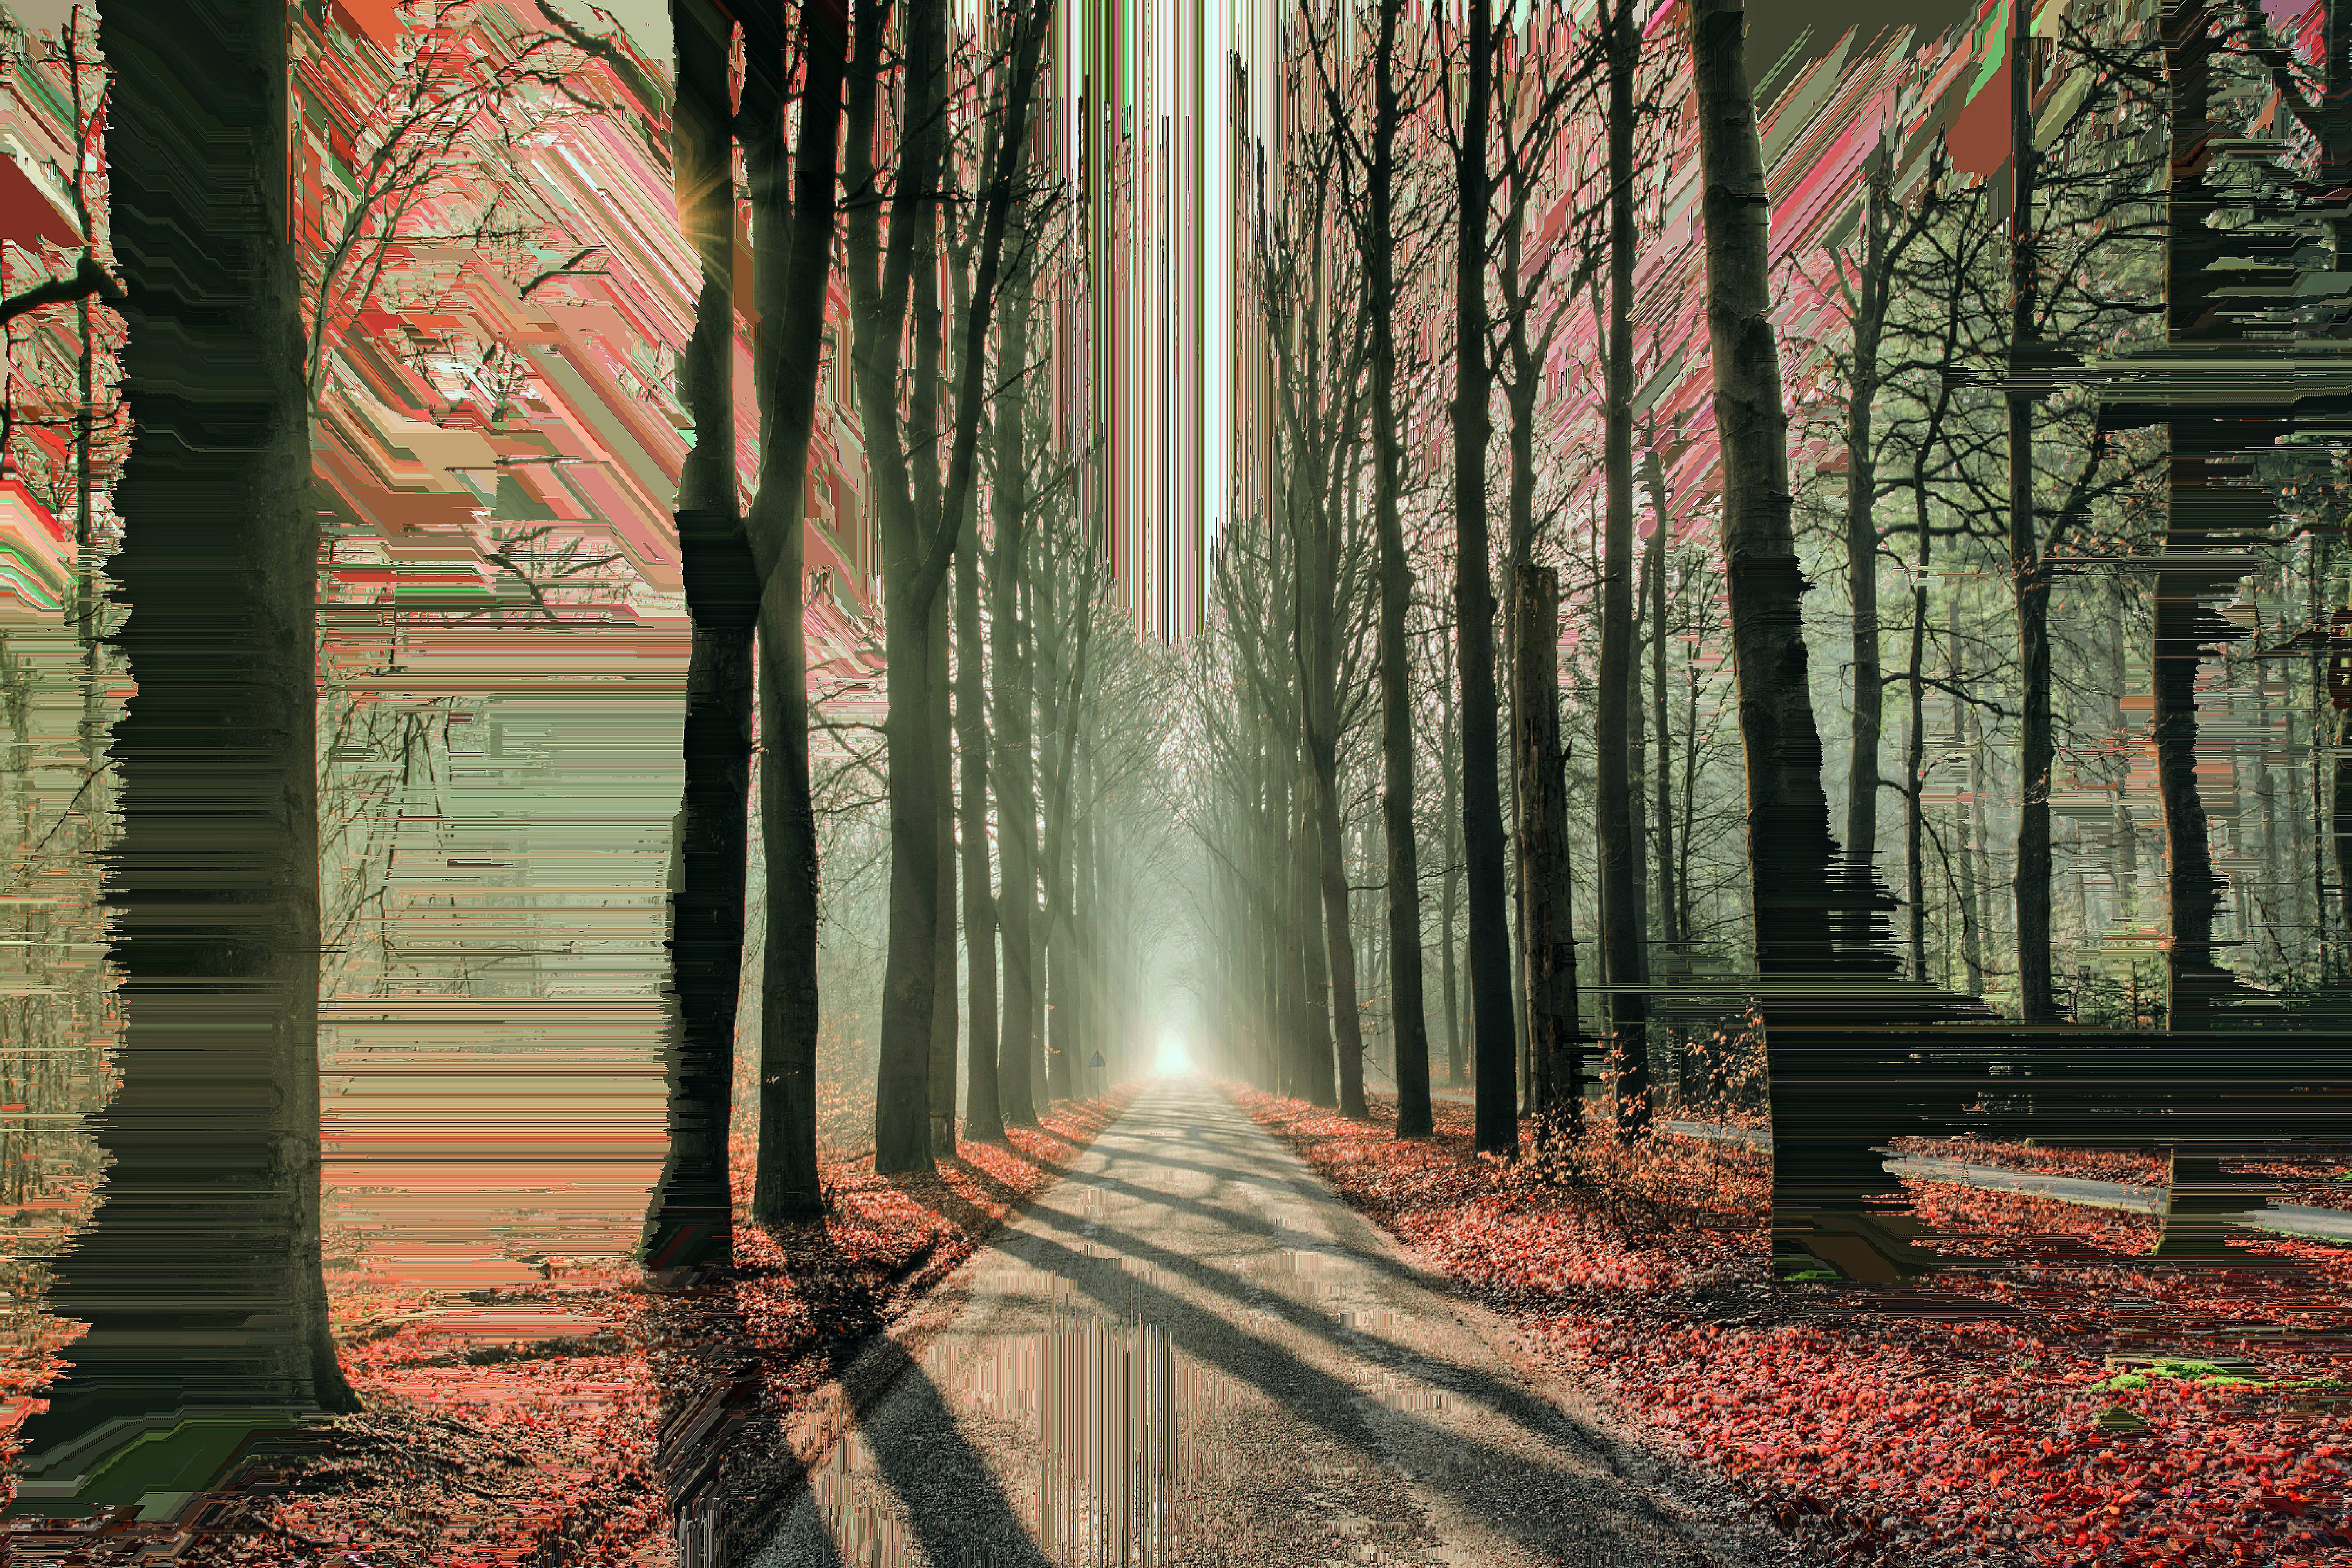 artistic glitch trees road 1574938680 - Artistic Glitch Trees Road -